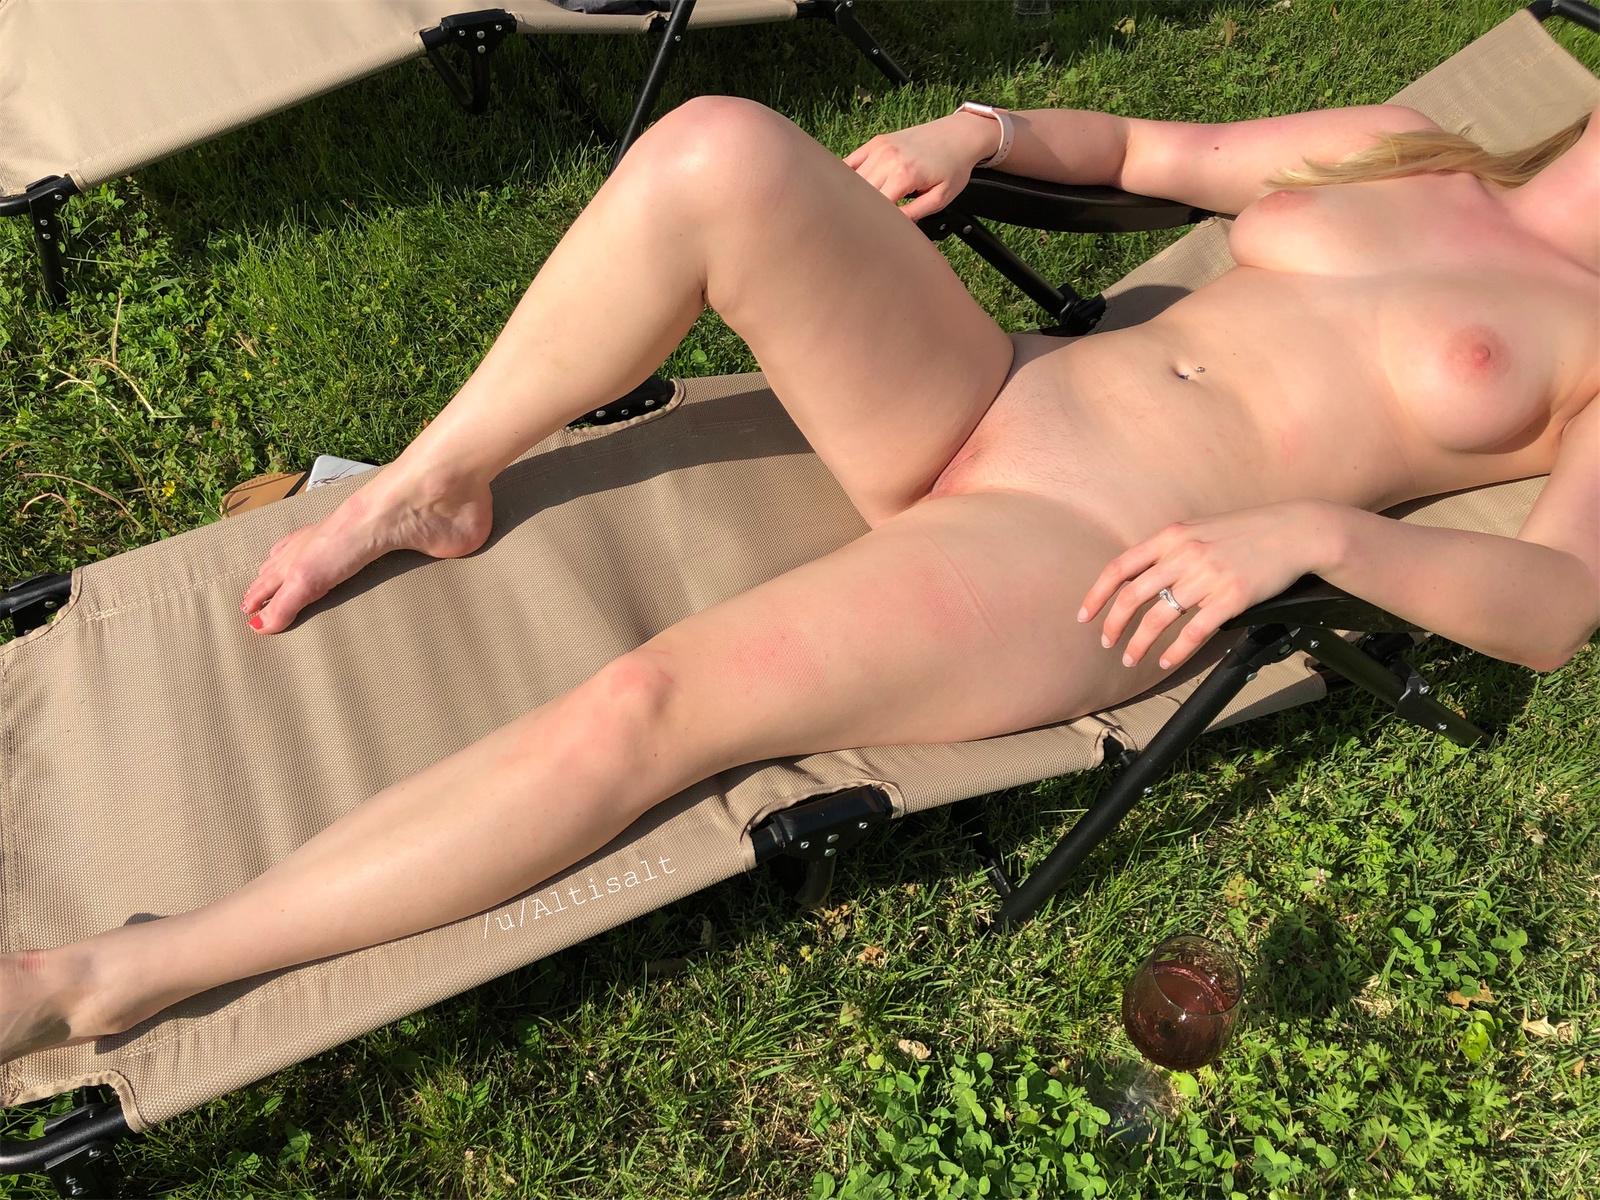 Giving the neighbors a good view! [f] 😘 Porno Photo - EPORNER